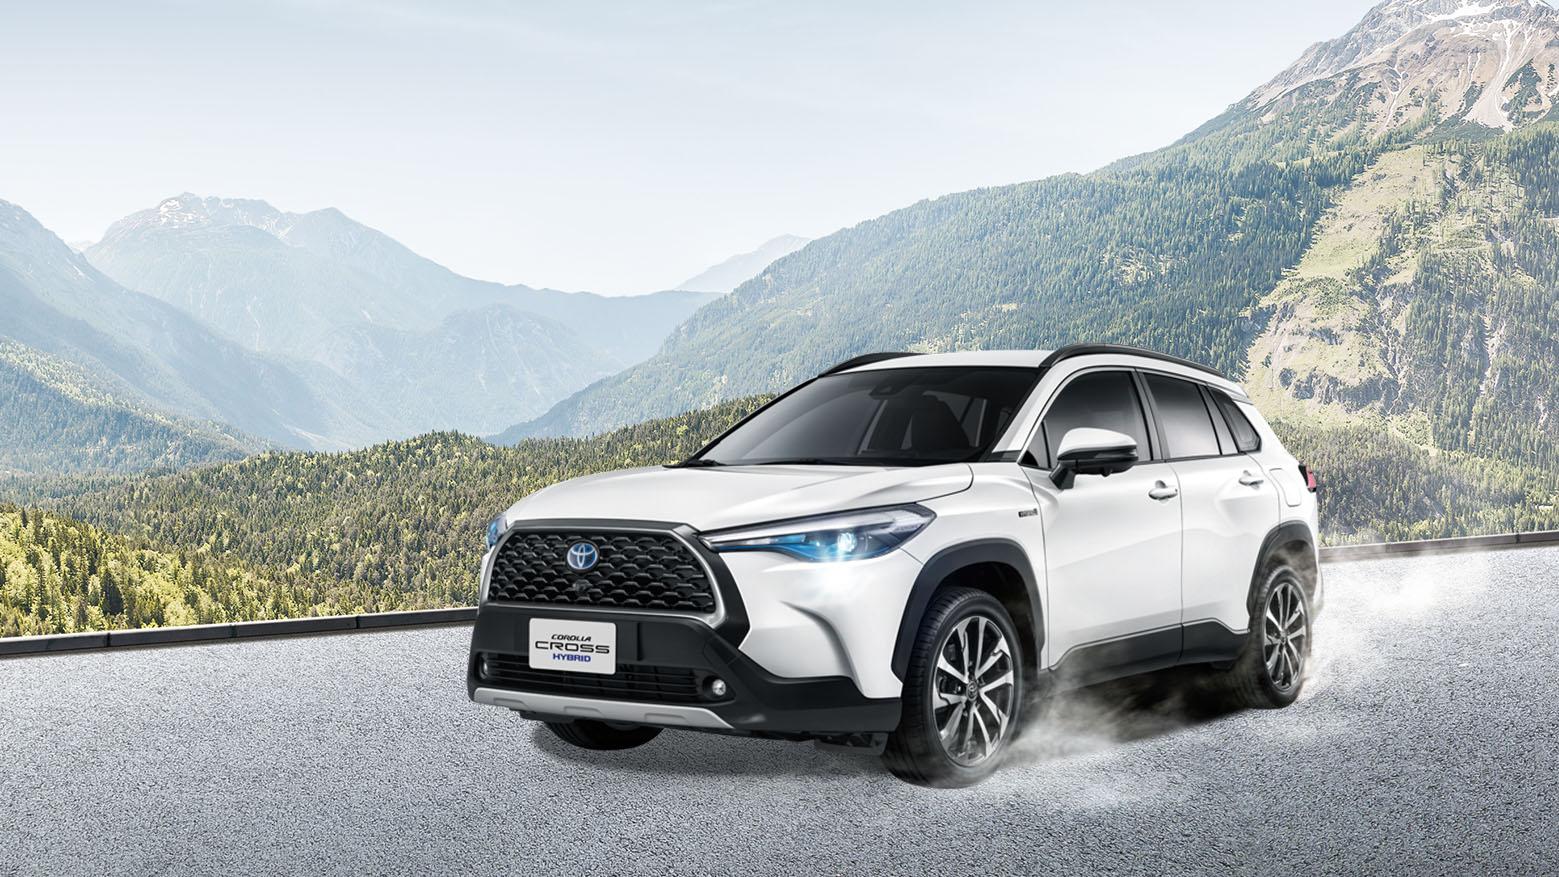 Toyota Corolla Cross 預售破 3,000 台,10/12 正式上市